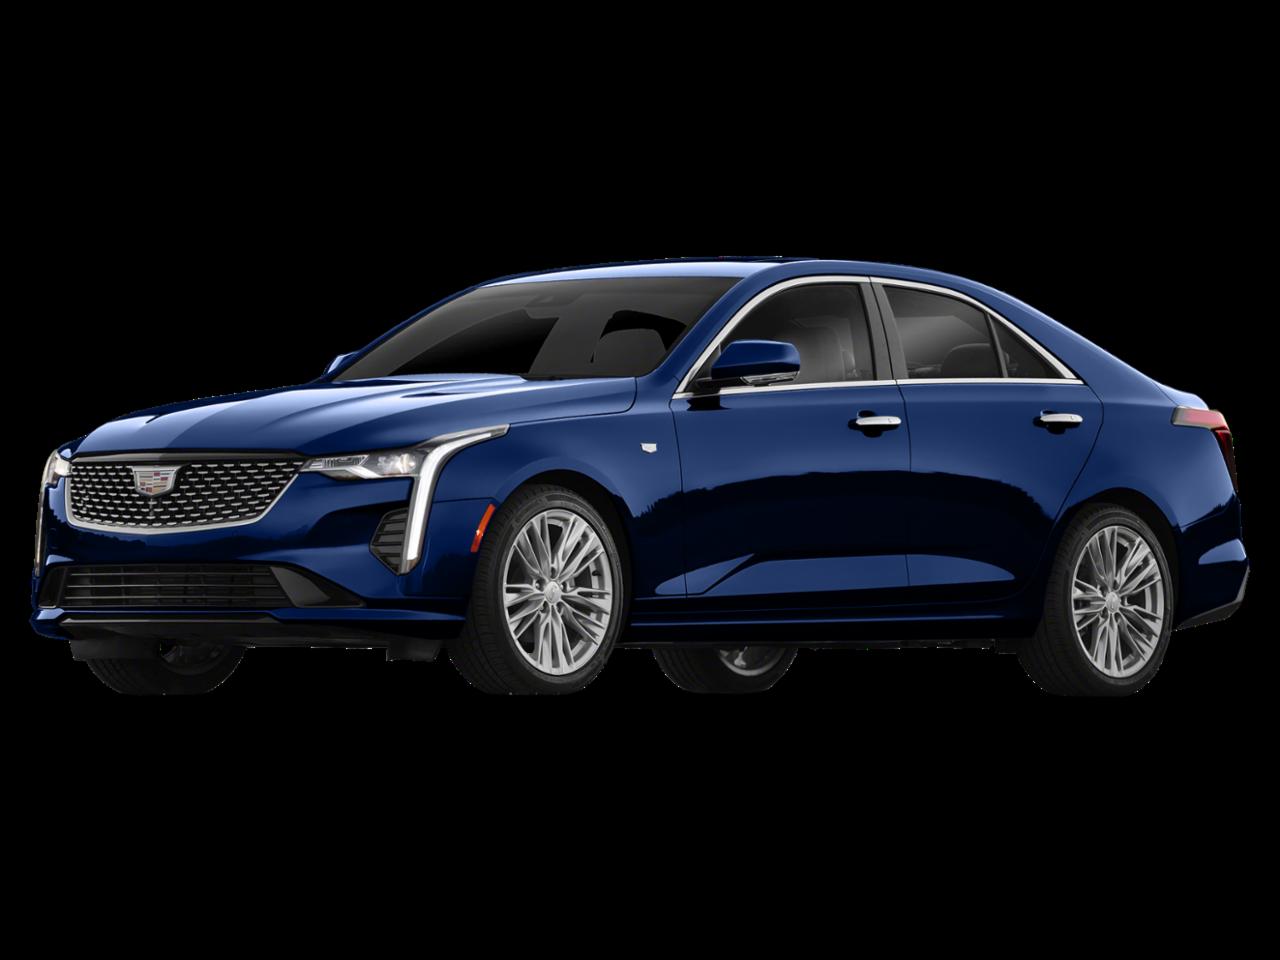 Cadillac 2020 CT4 Luxury